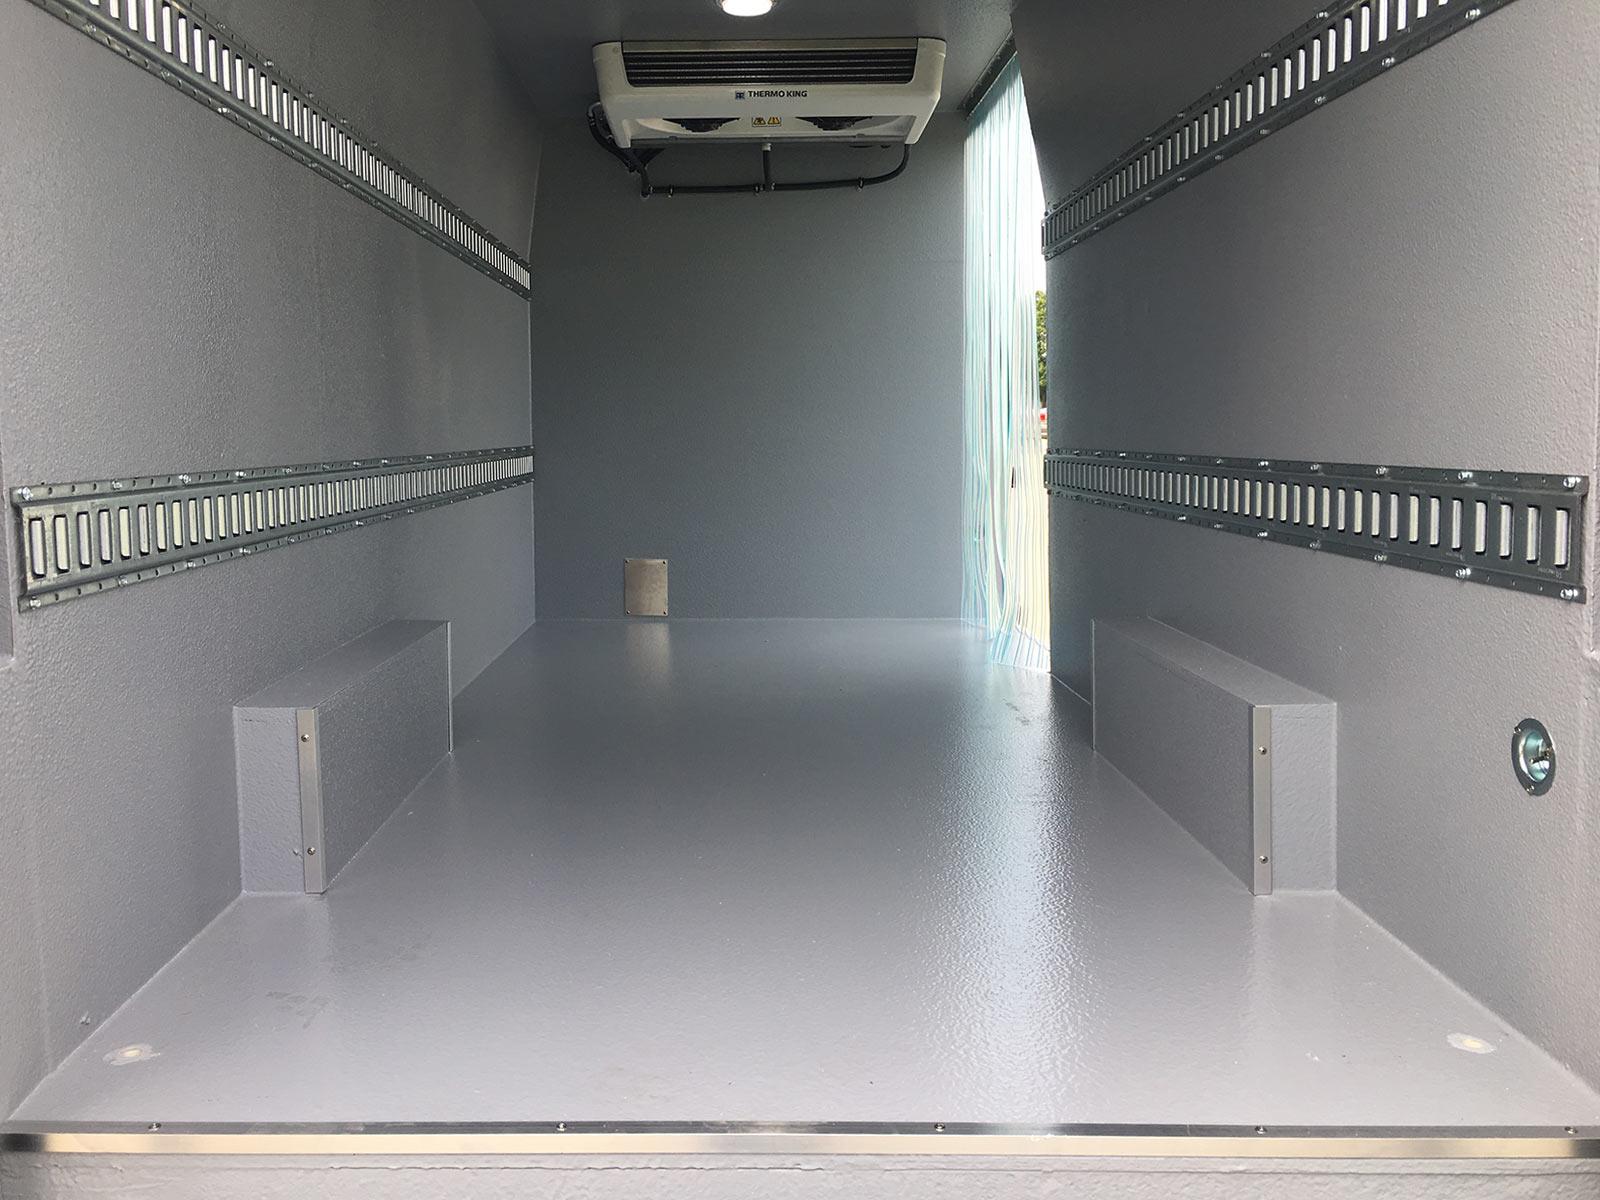 Refrigerated Vans Dodge Ram Promaster 3500 Bush Trucks